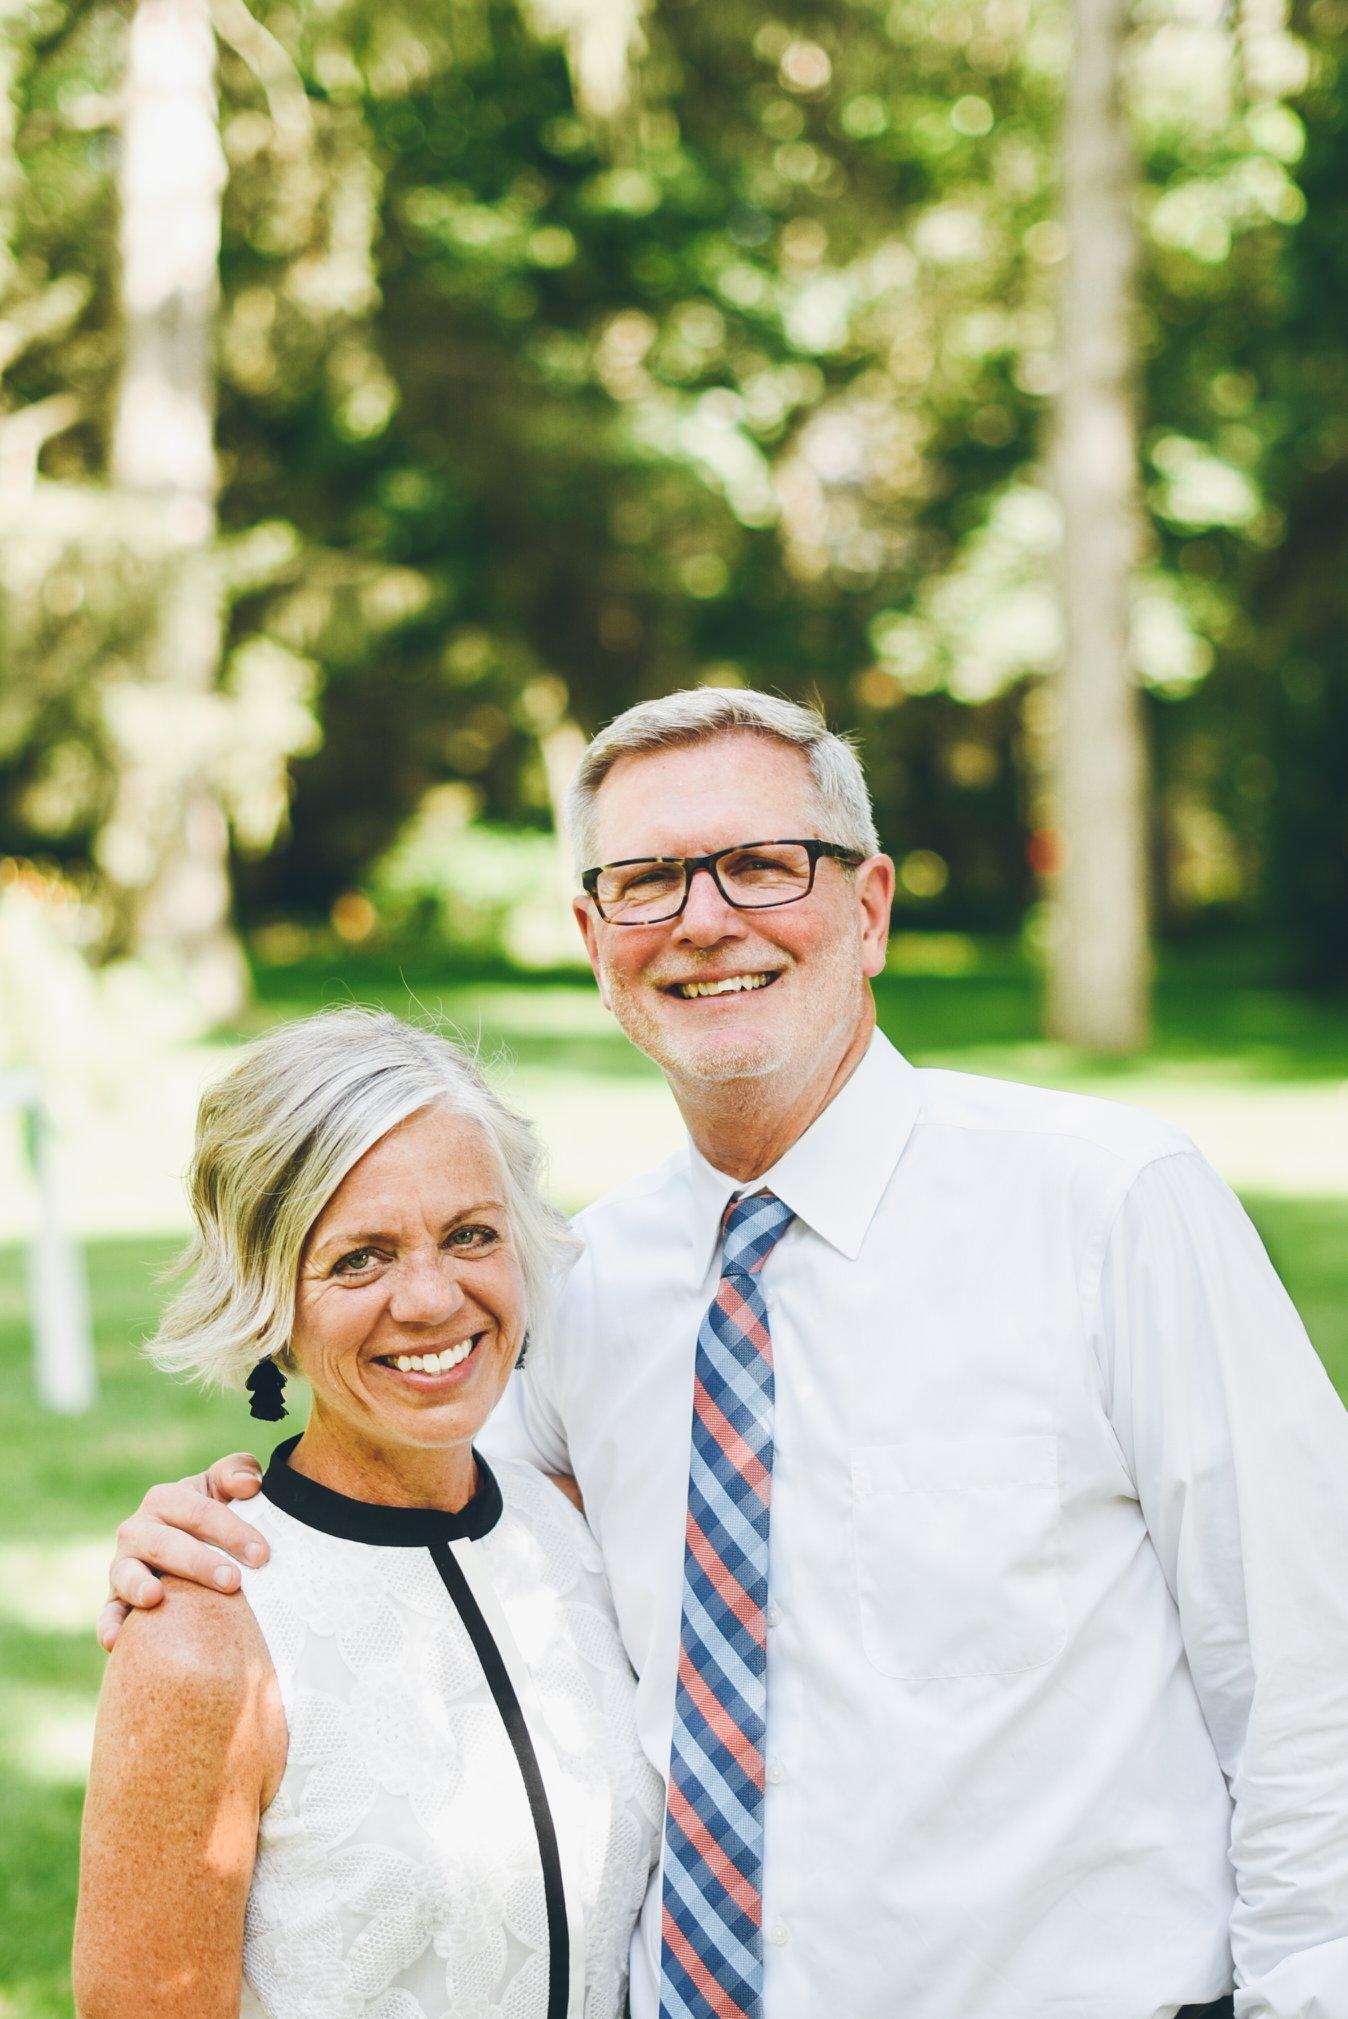 Tim and Laura Hoekstra